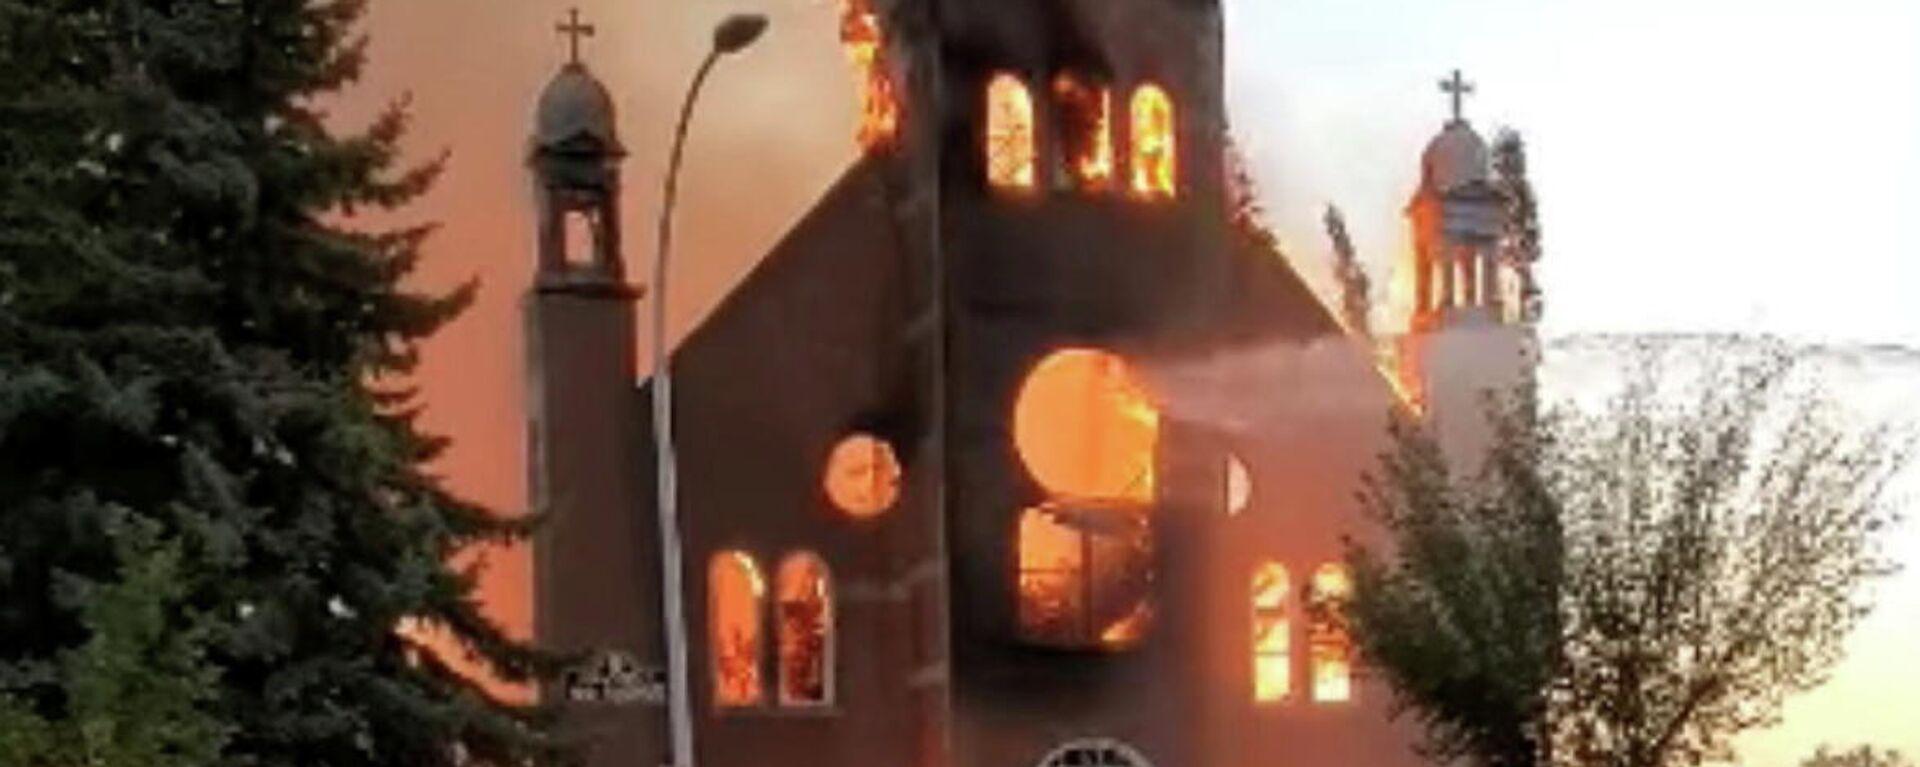 Incendio en una iglesia de Morinville, Canadá - Sputnik Mundo, 1920, 02.07.2021